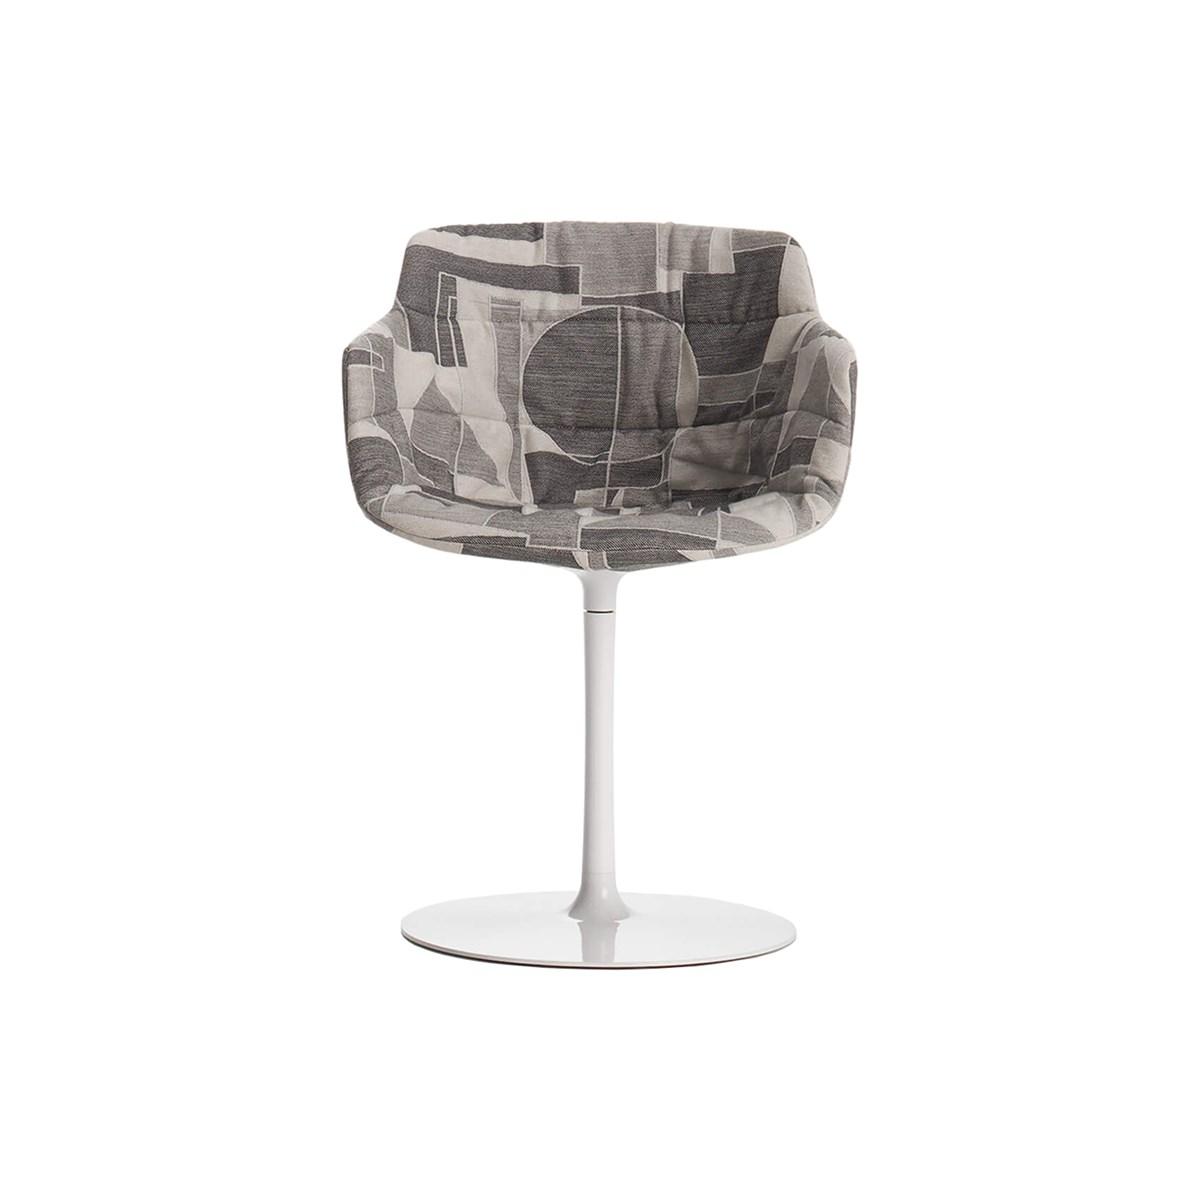 MDF-Italia-Jean-Marie-Massaud-Flow-Textile-Chair-Matisse-1